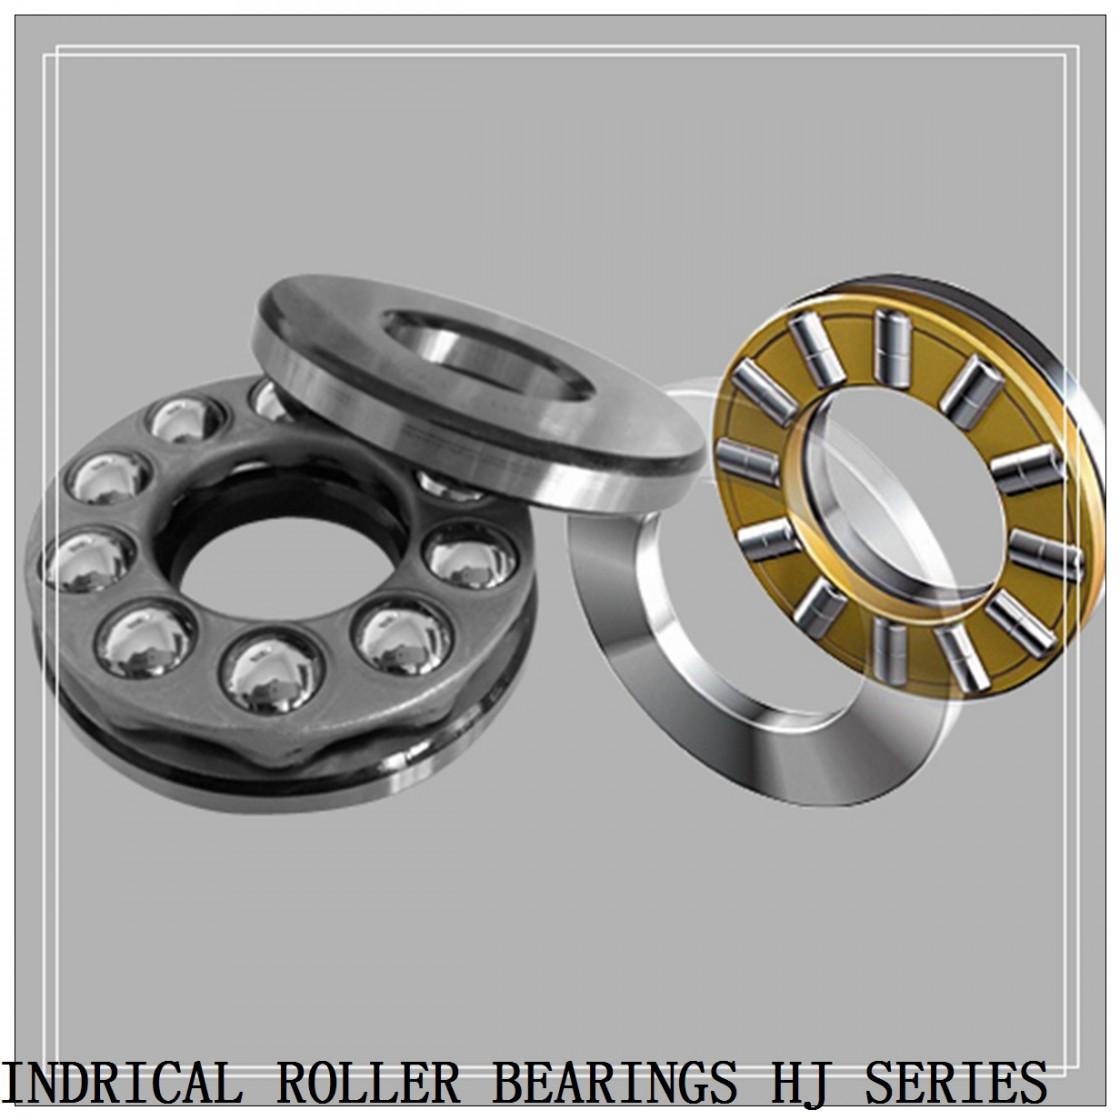 HJ-14017048 IR- CYLINDRICAL ROLLER BEARINGS HJ SERIES